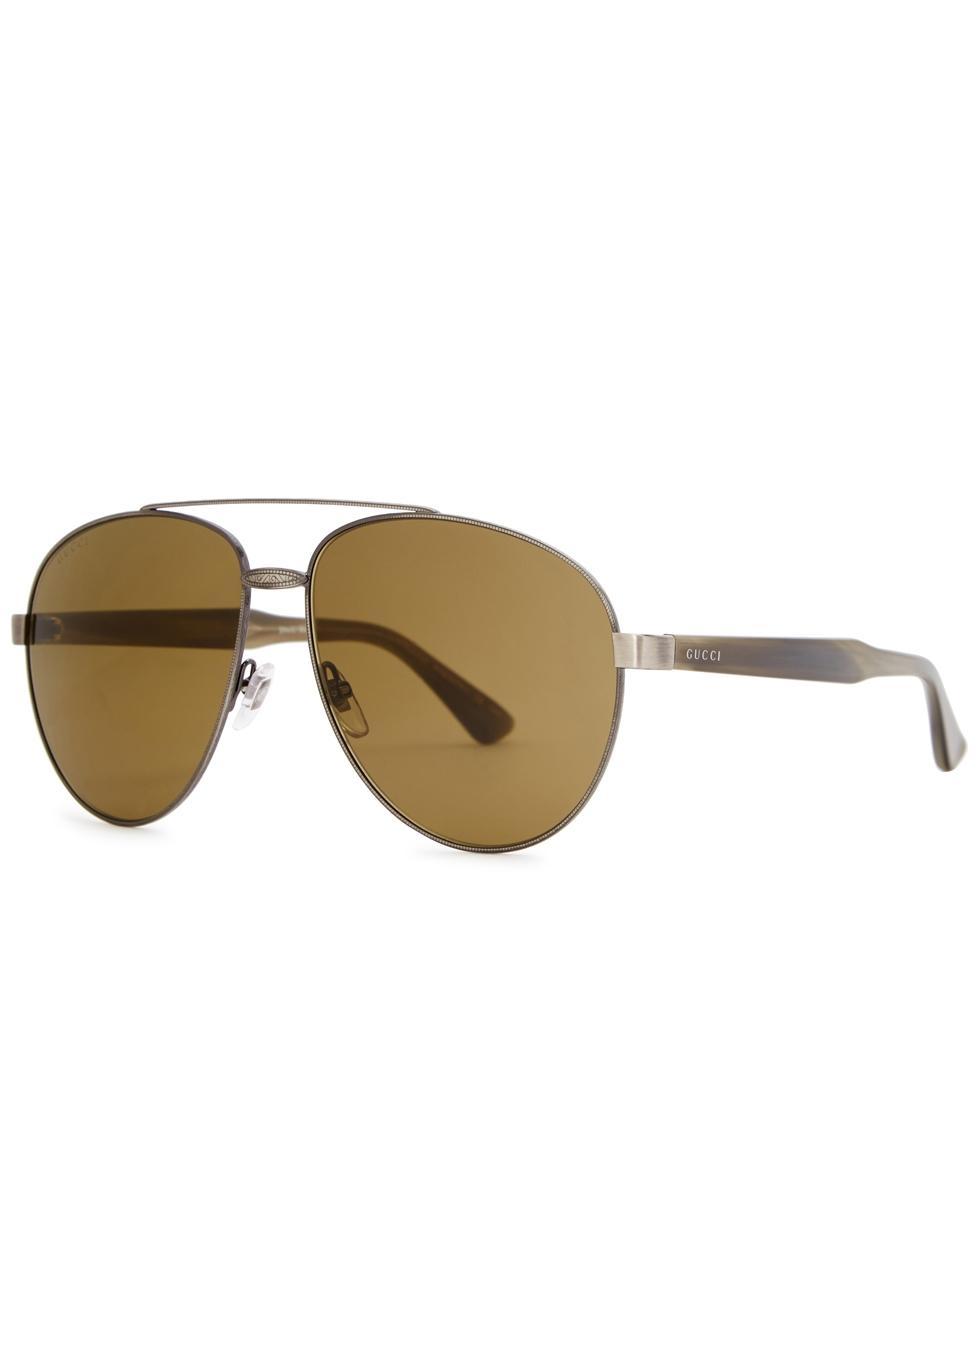 Gunmetal aviator-style sunglasses - Gucci